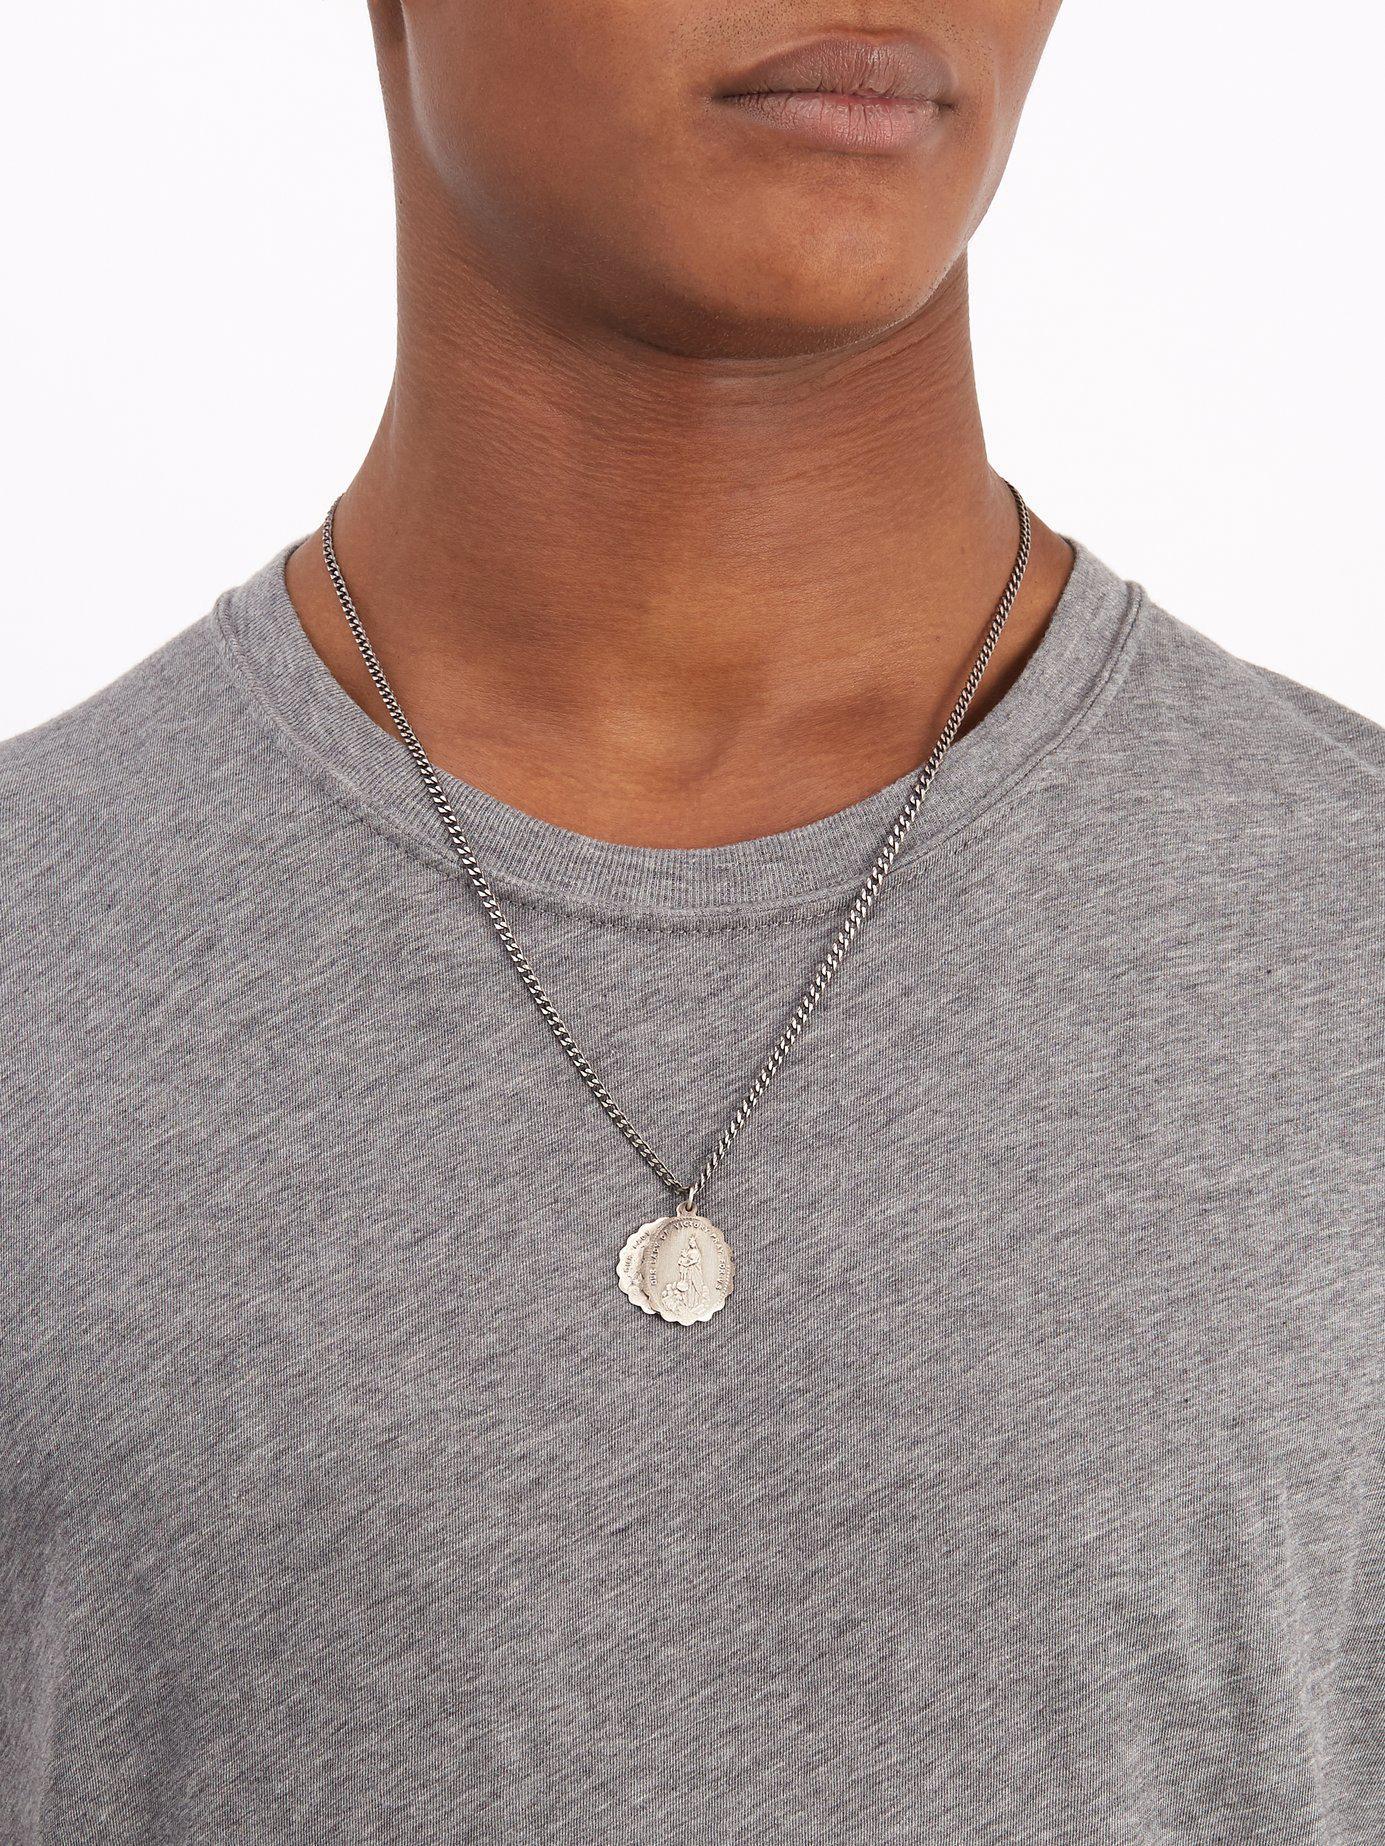 18778e8dc8576 Lyst - Miansai Saints Sterling Silver Necklace in Metallic for Men